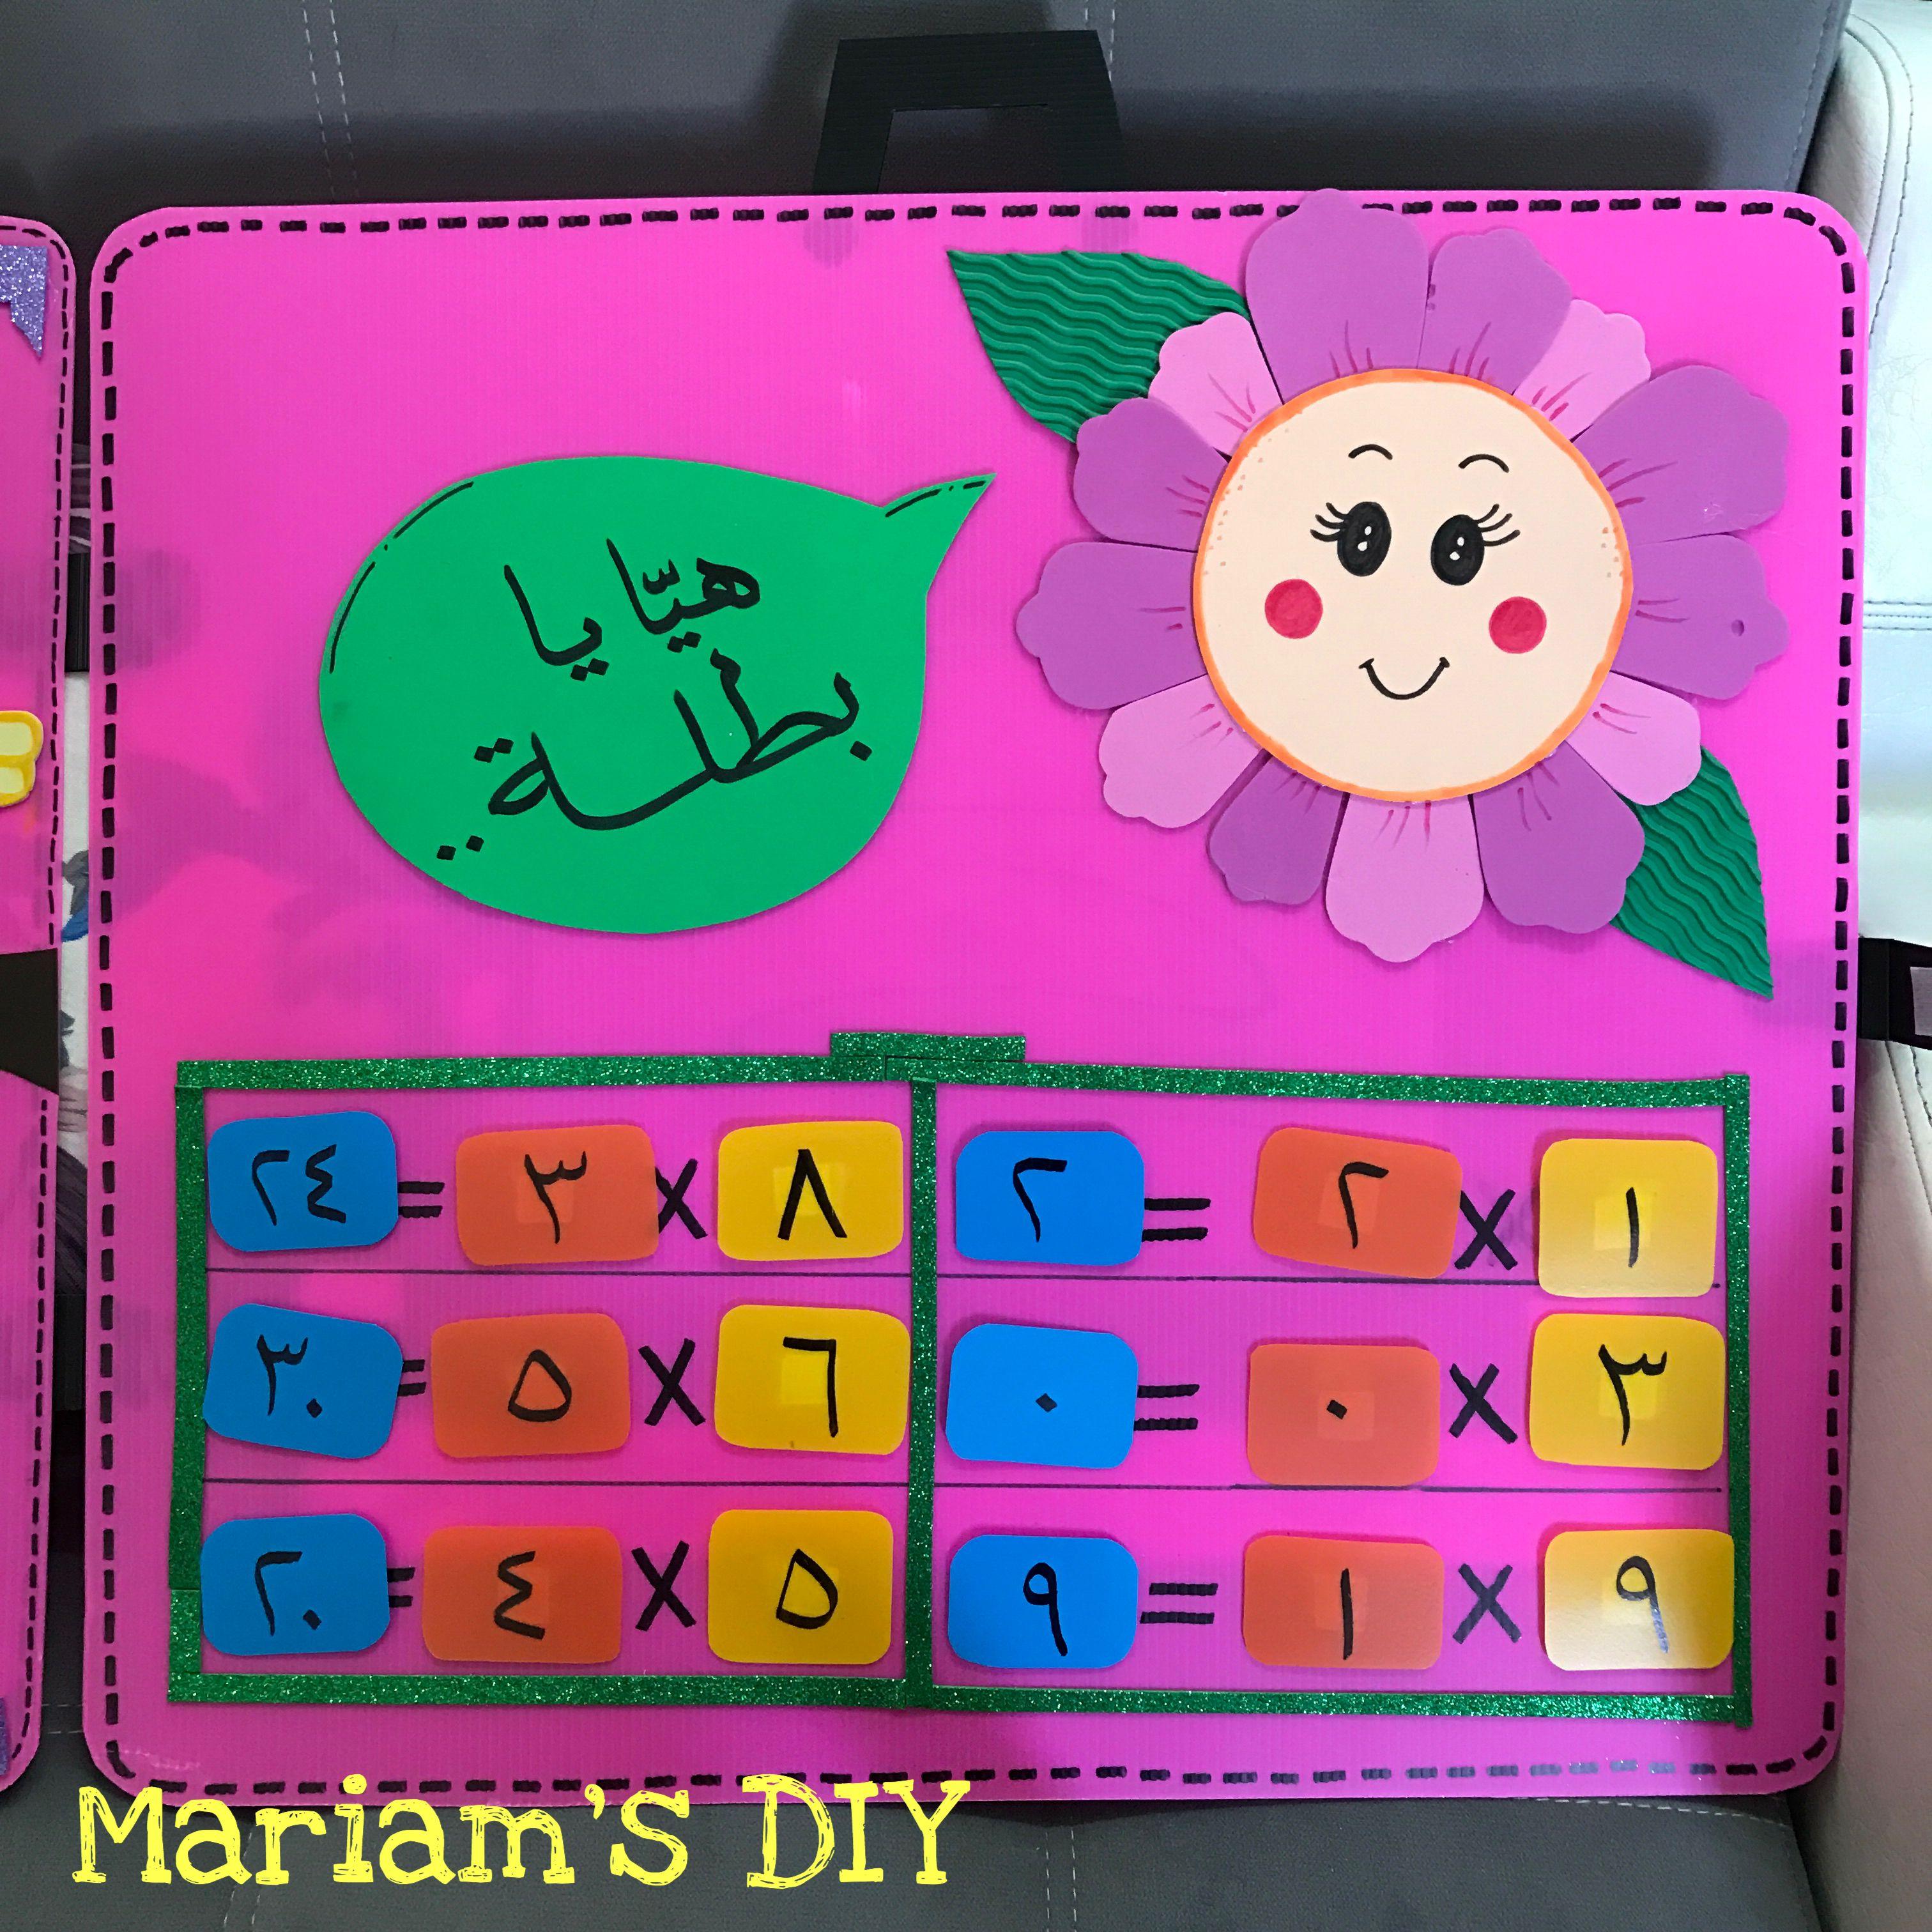 Pin By Mariam S Diy مريم دعيس On وسائل تعليمية يدوية Math School Diy